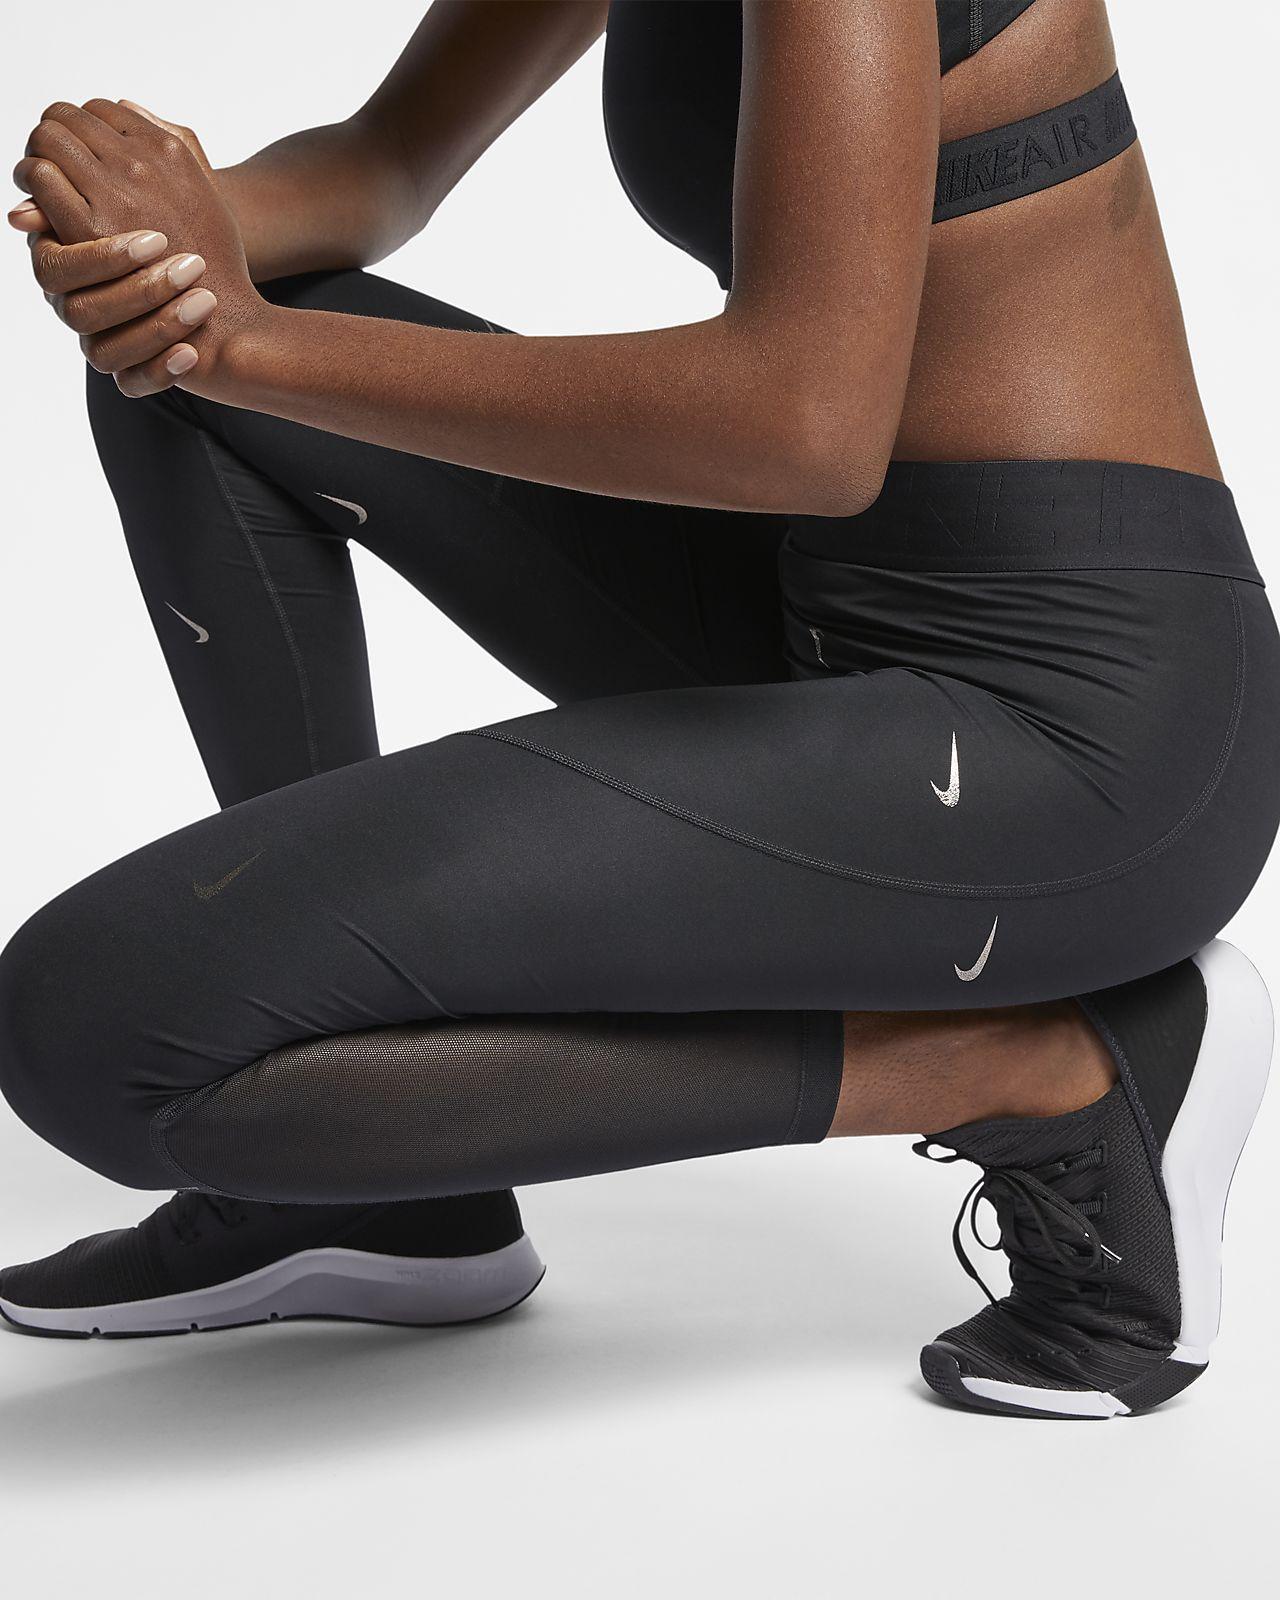 best sneakers d5fe8 d2bf4 ... Nike Pro Women s Metallic Printed Tights